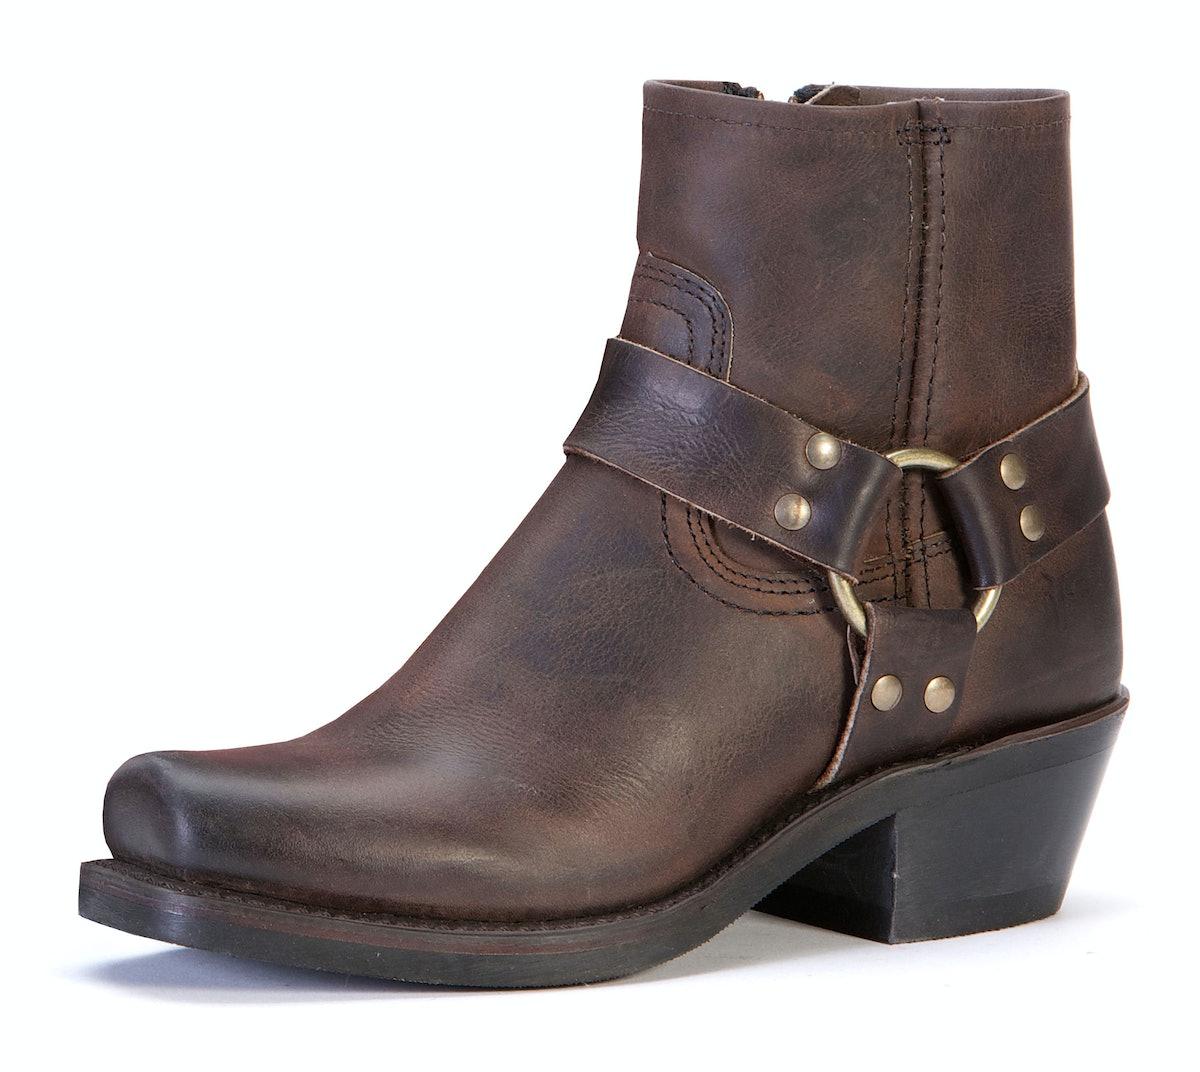 The Frye Company boots, $248, [thefryecompany.com](http://www.thefryecompany.com/womens-boots/bestsellers/77455/harness-8r).